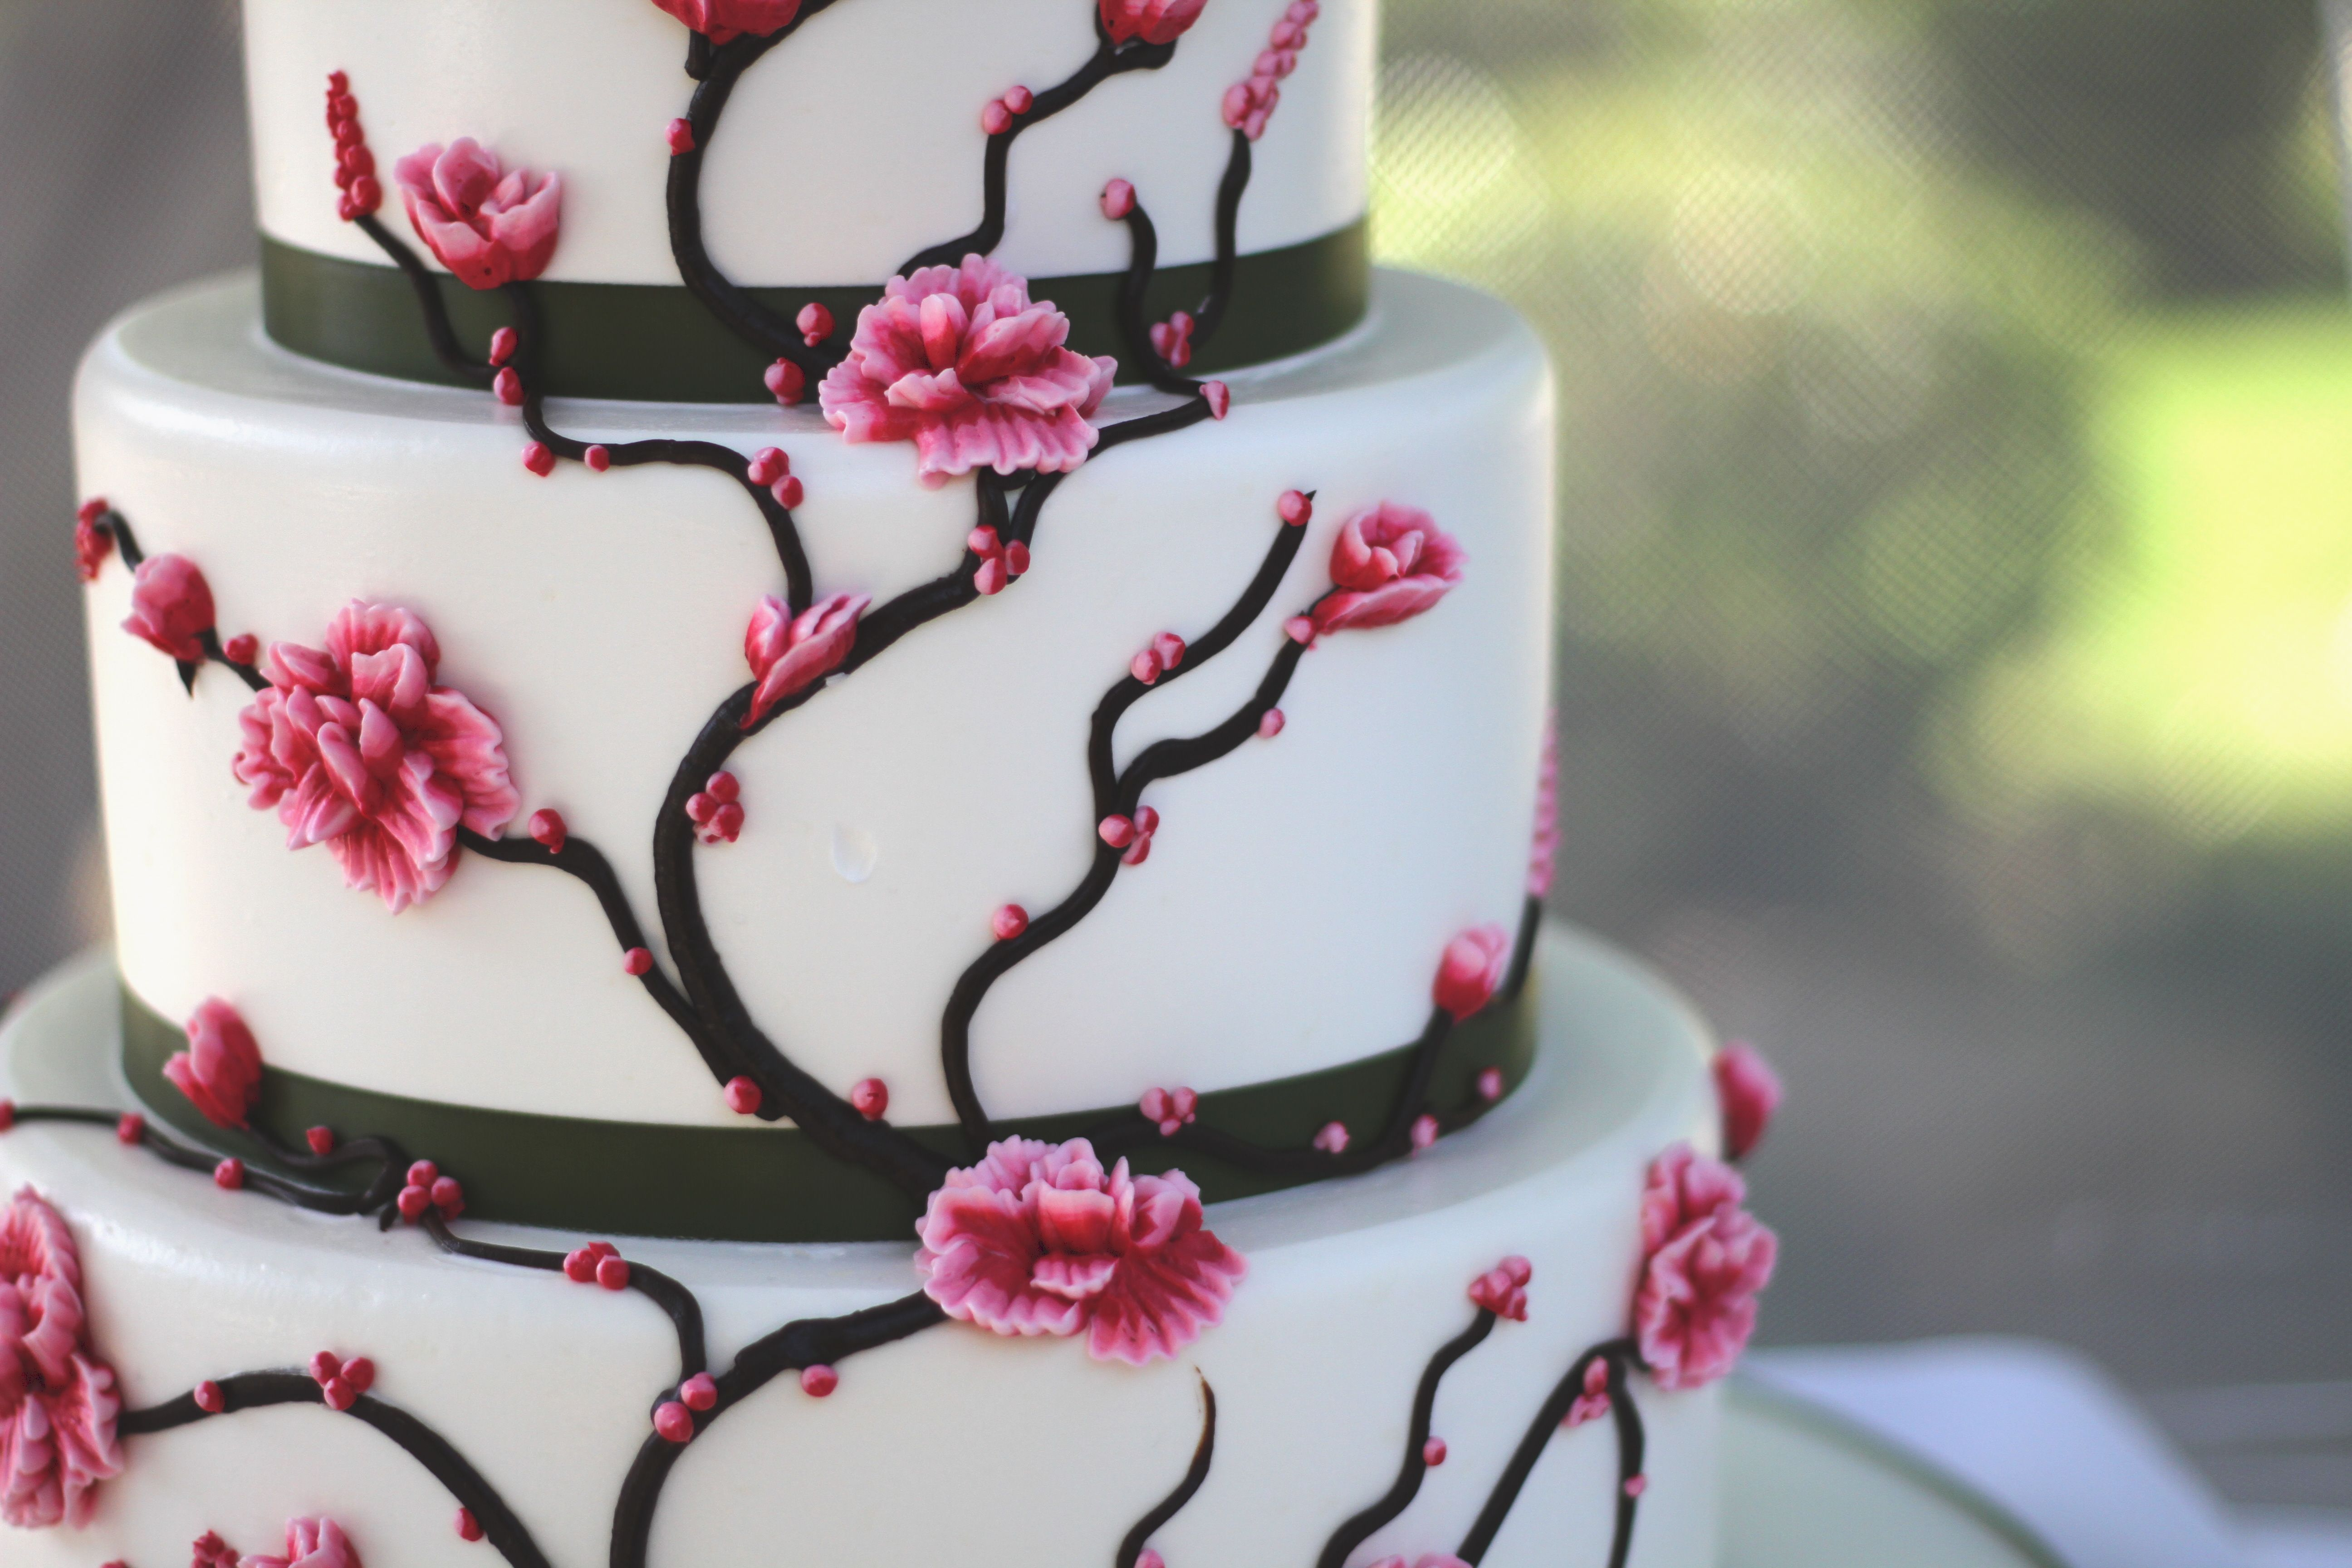 Csulb japanese garden wedding flowers cake wedding cake for Koi fish pond csulb